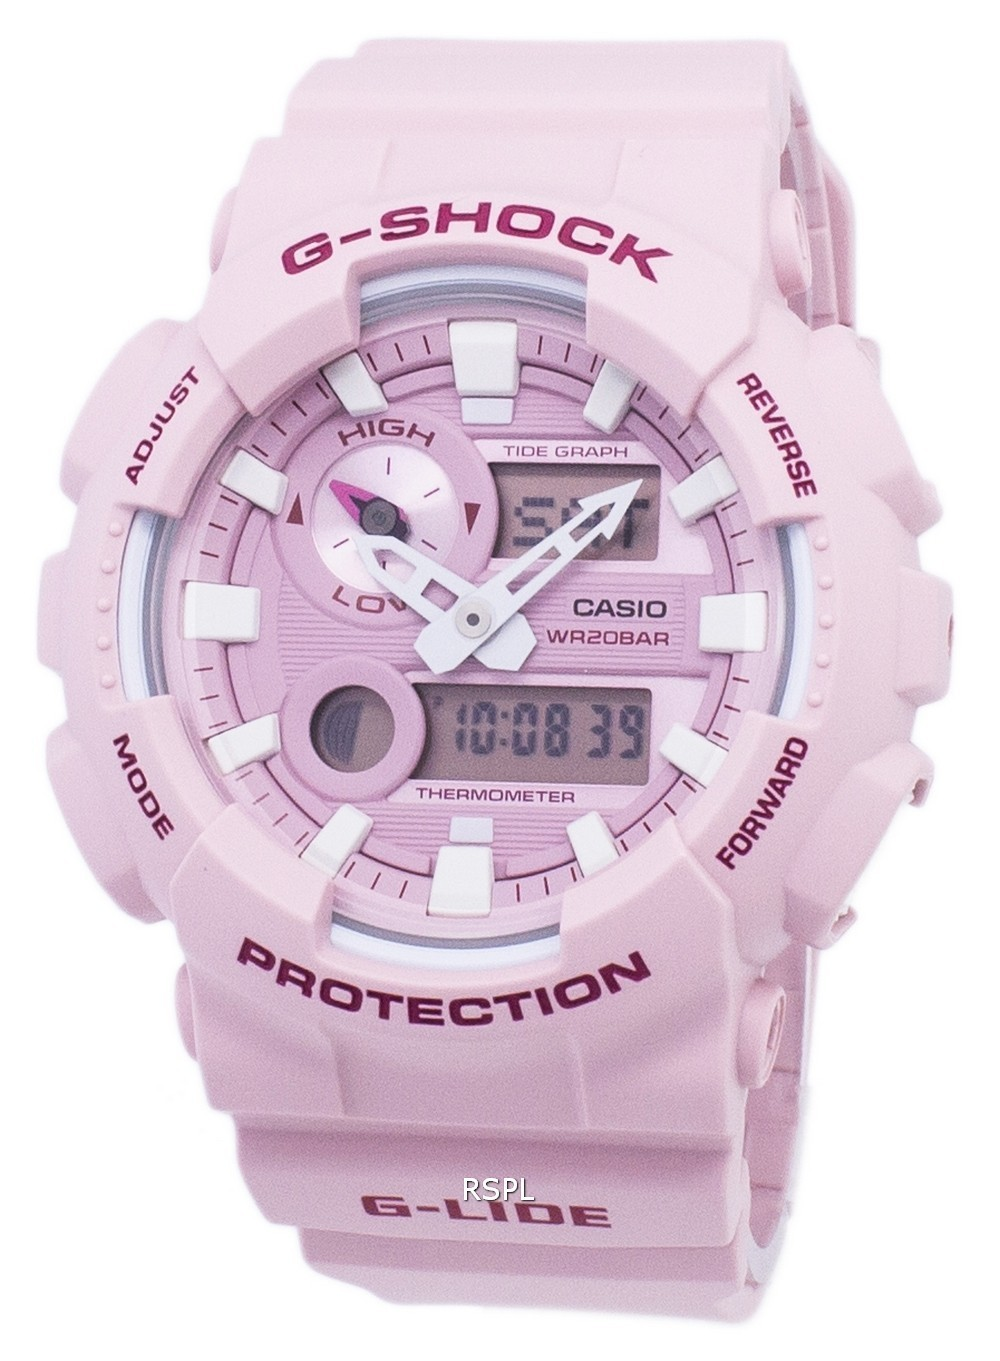 308226cc1911 Casio G-Shock G-Lide Tide Graph Analog Digital GAX-100CSA-4A GAX100CSA-4A  Men s Watch